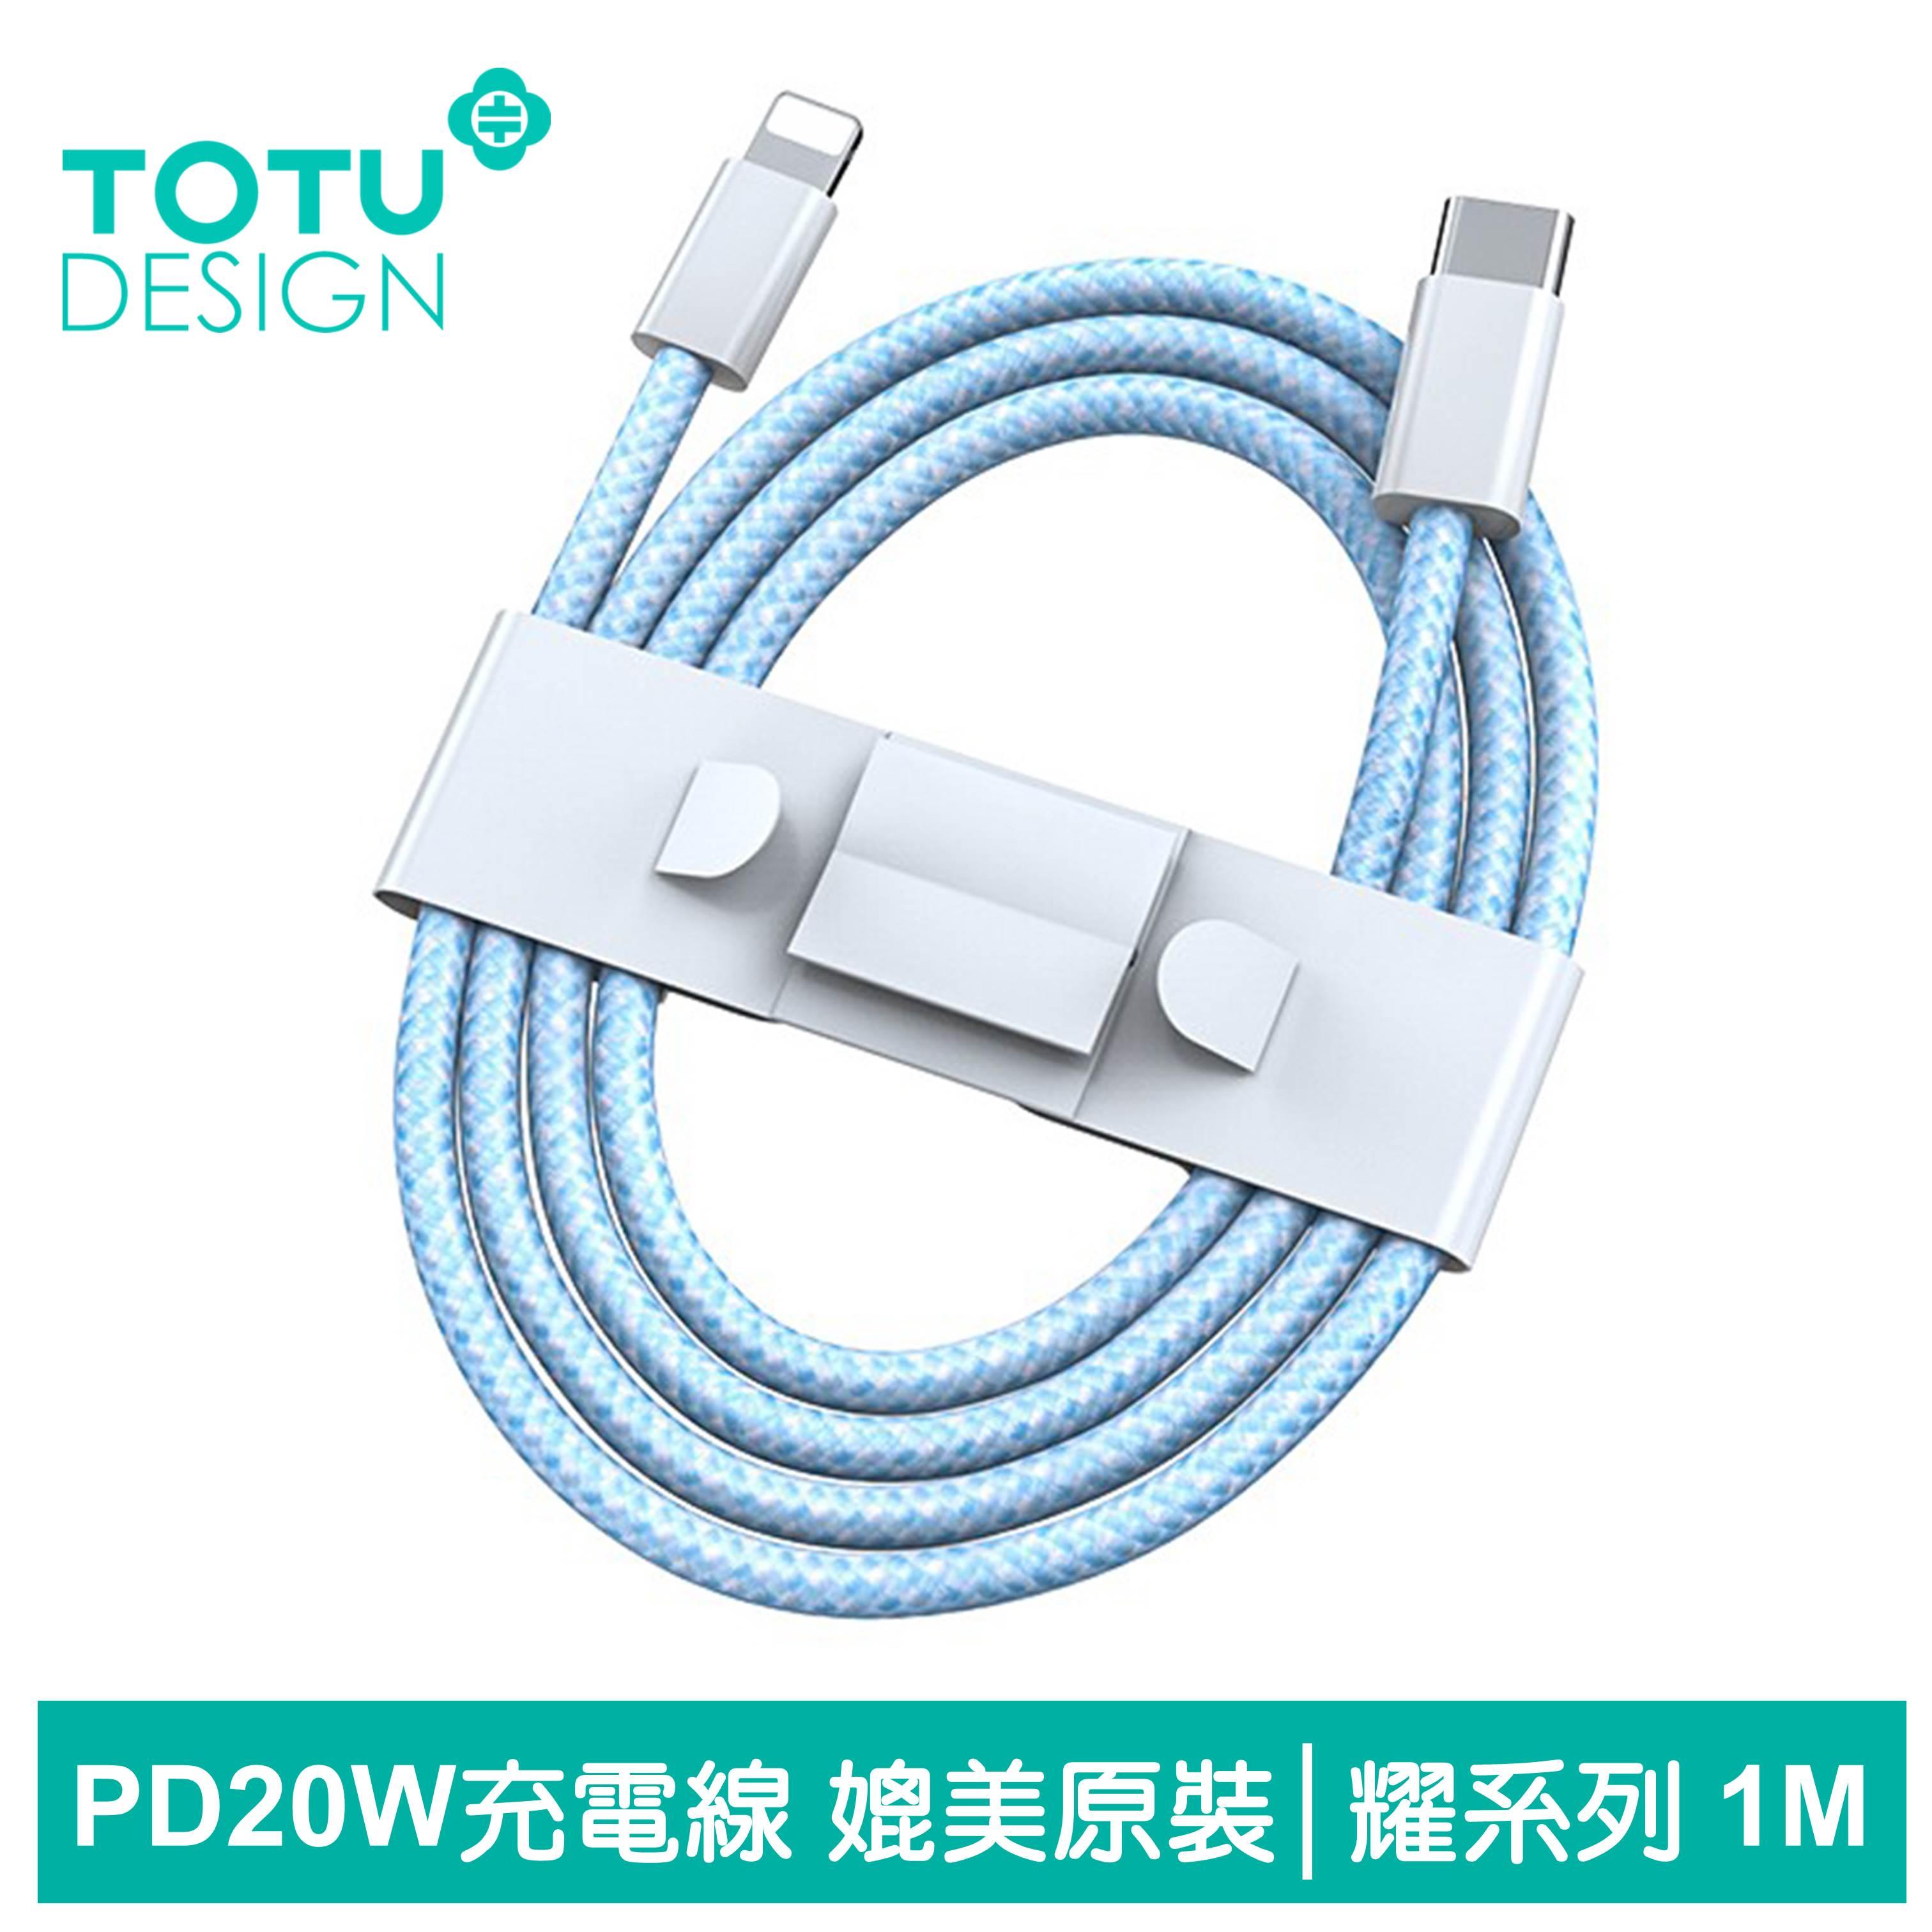 TOTU台灣官方 PD/Lightning/Type-C/iPhone充電線傳輸線編織快充線 20W 媲美原裝 耀系列 1M 藍色